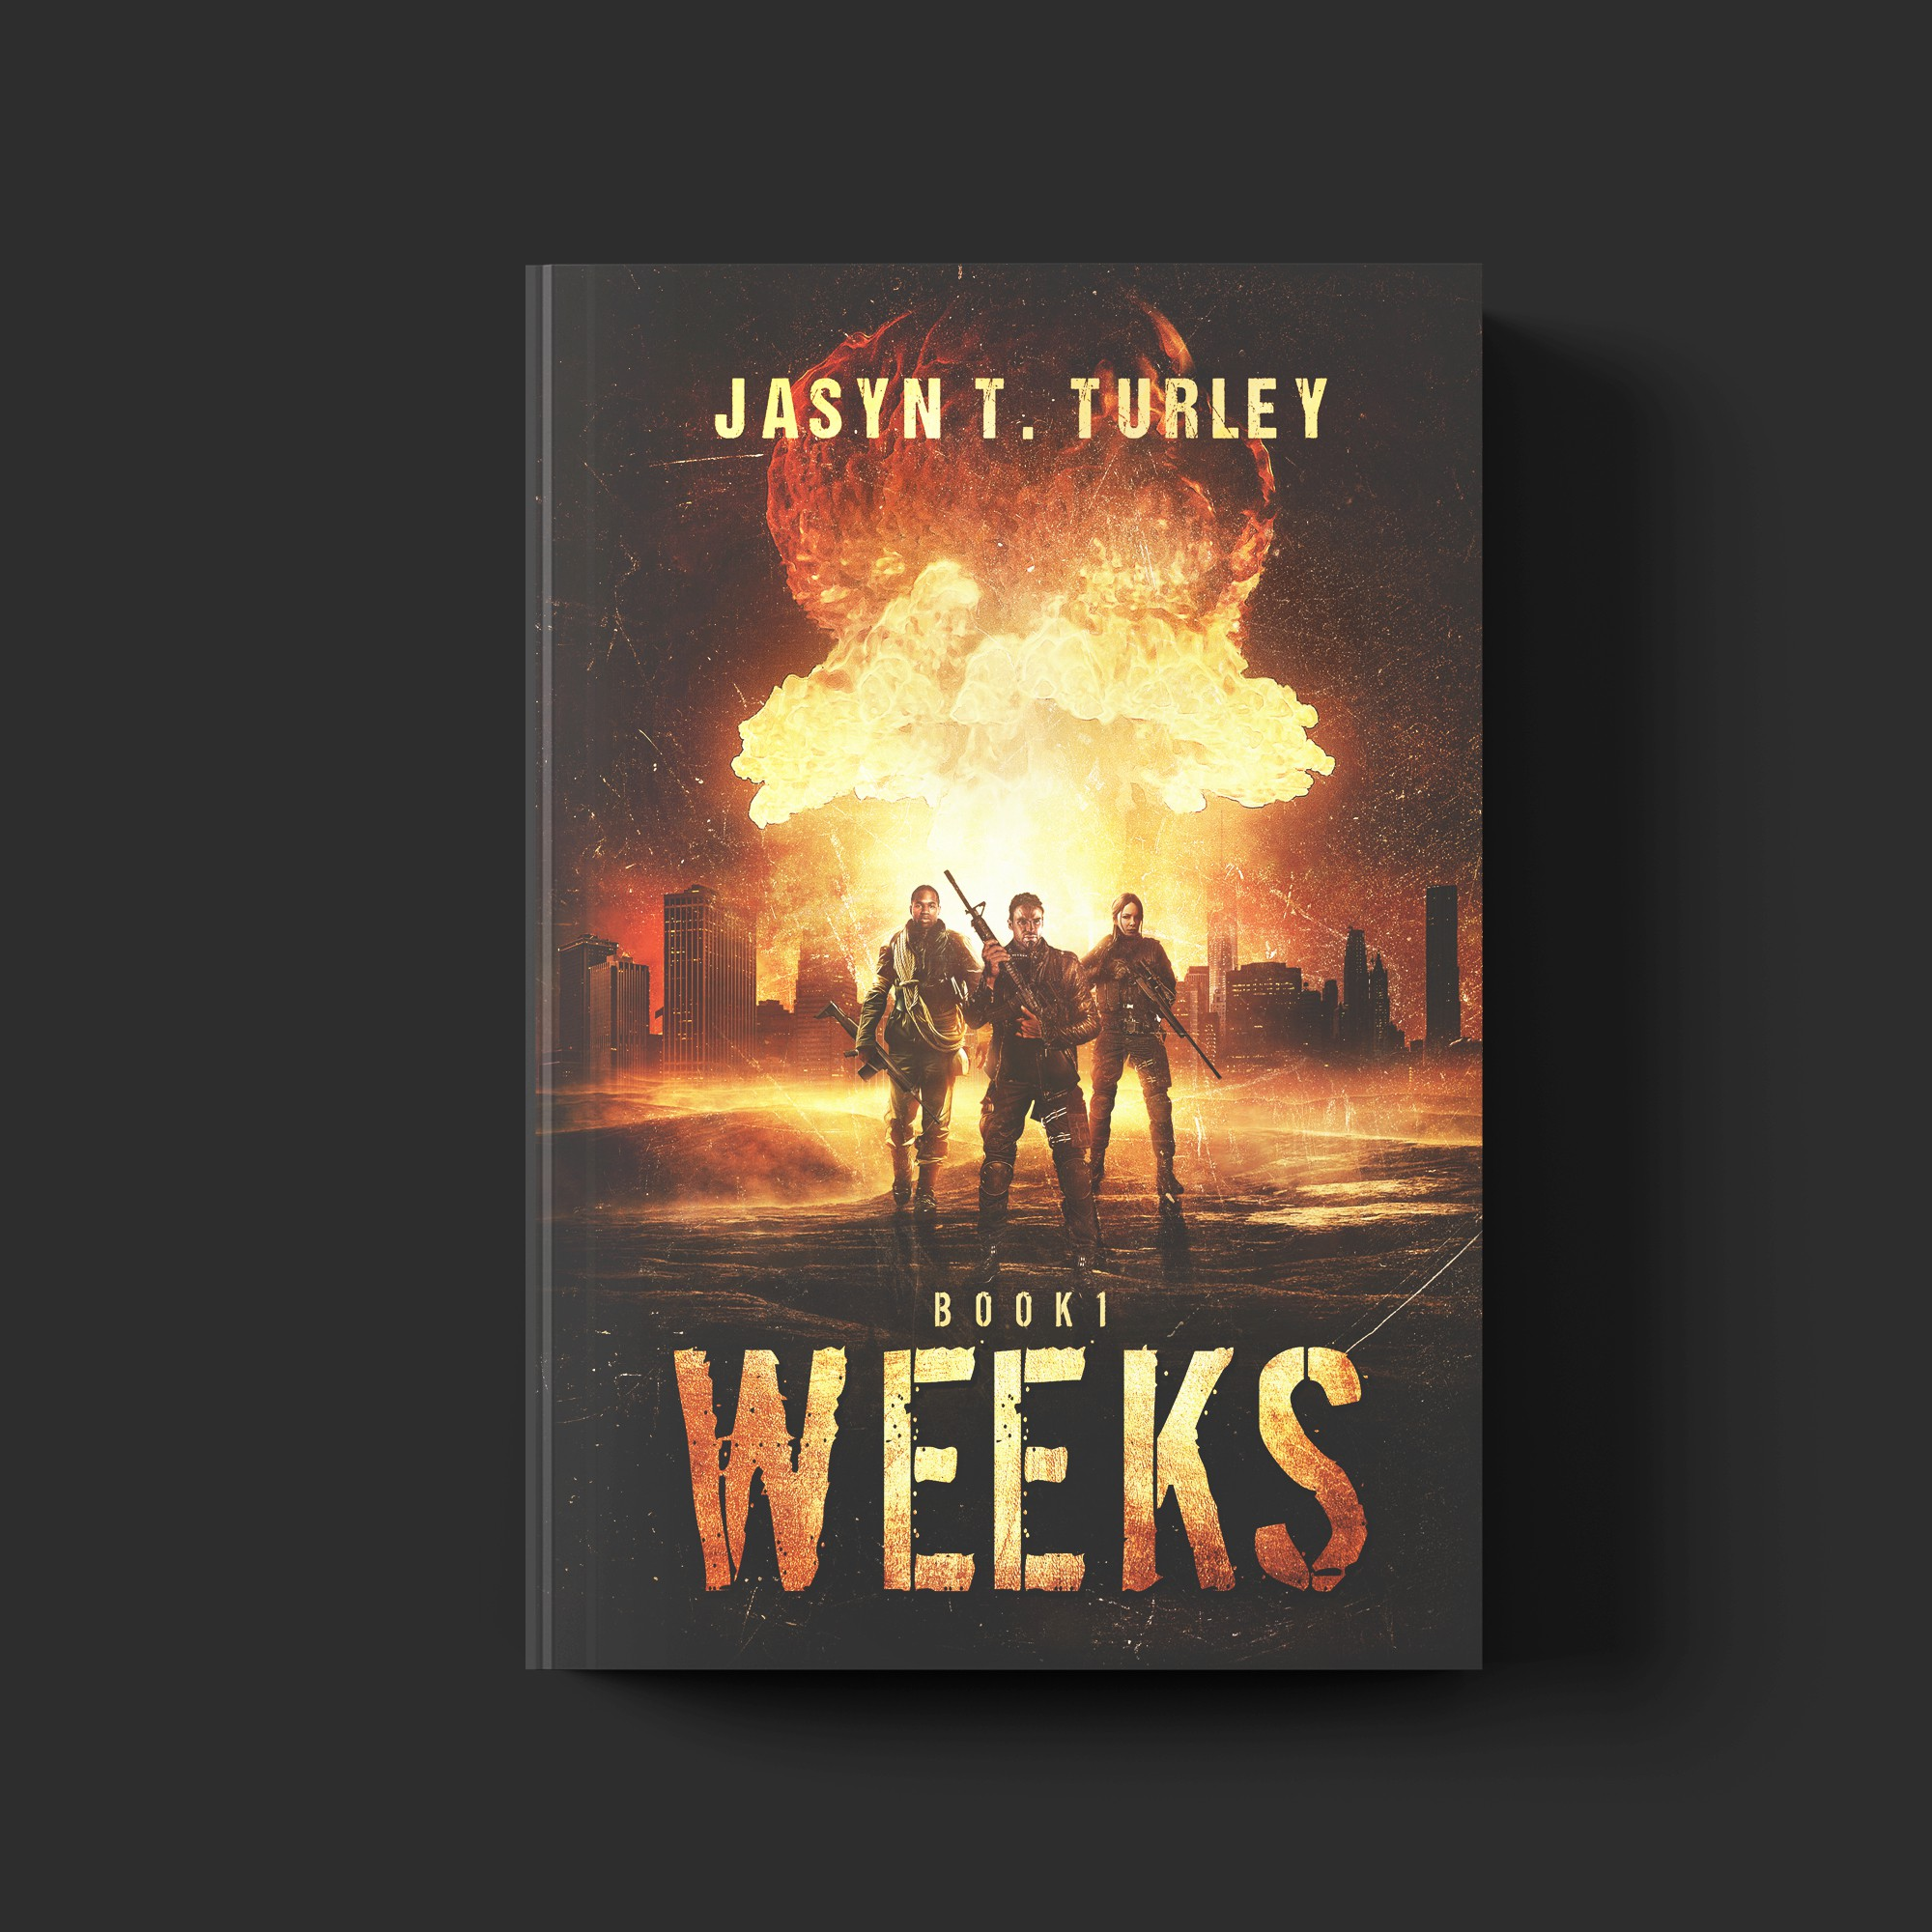 WEEKS Book One paperback/eBook contest.